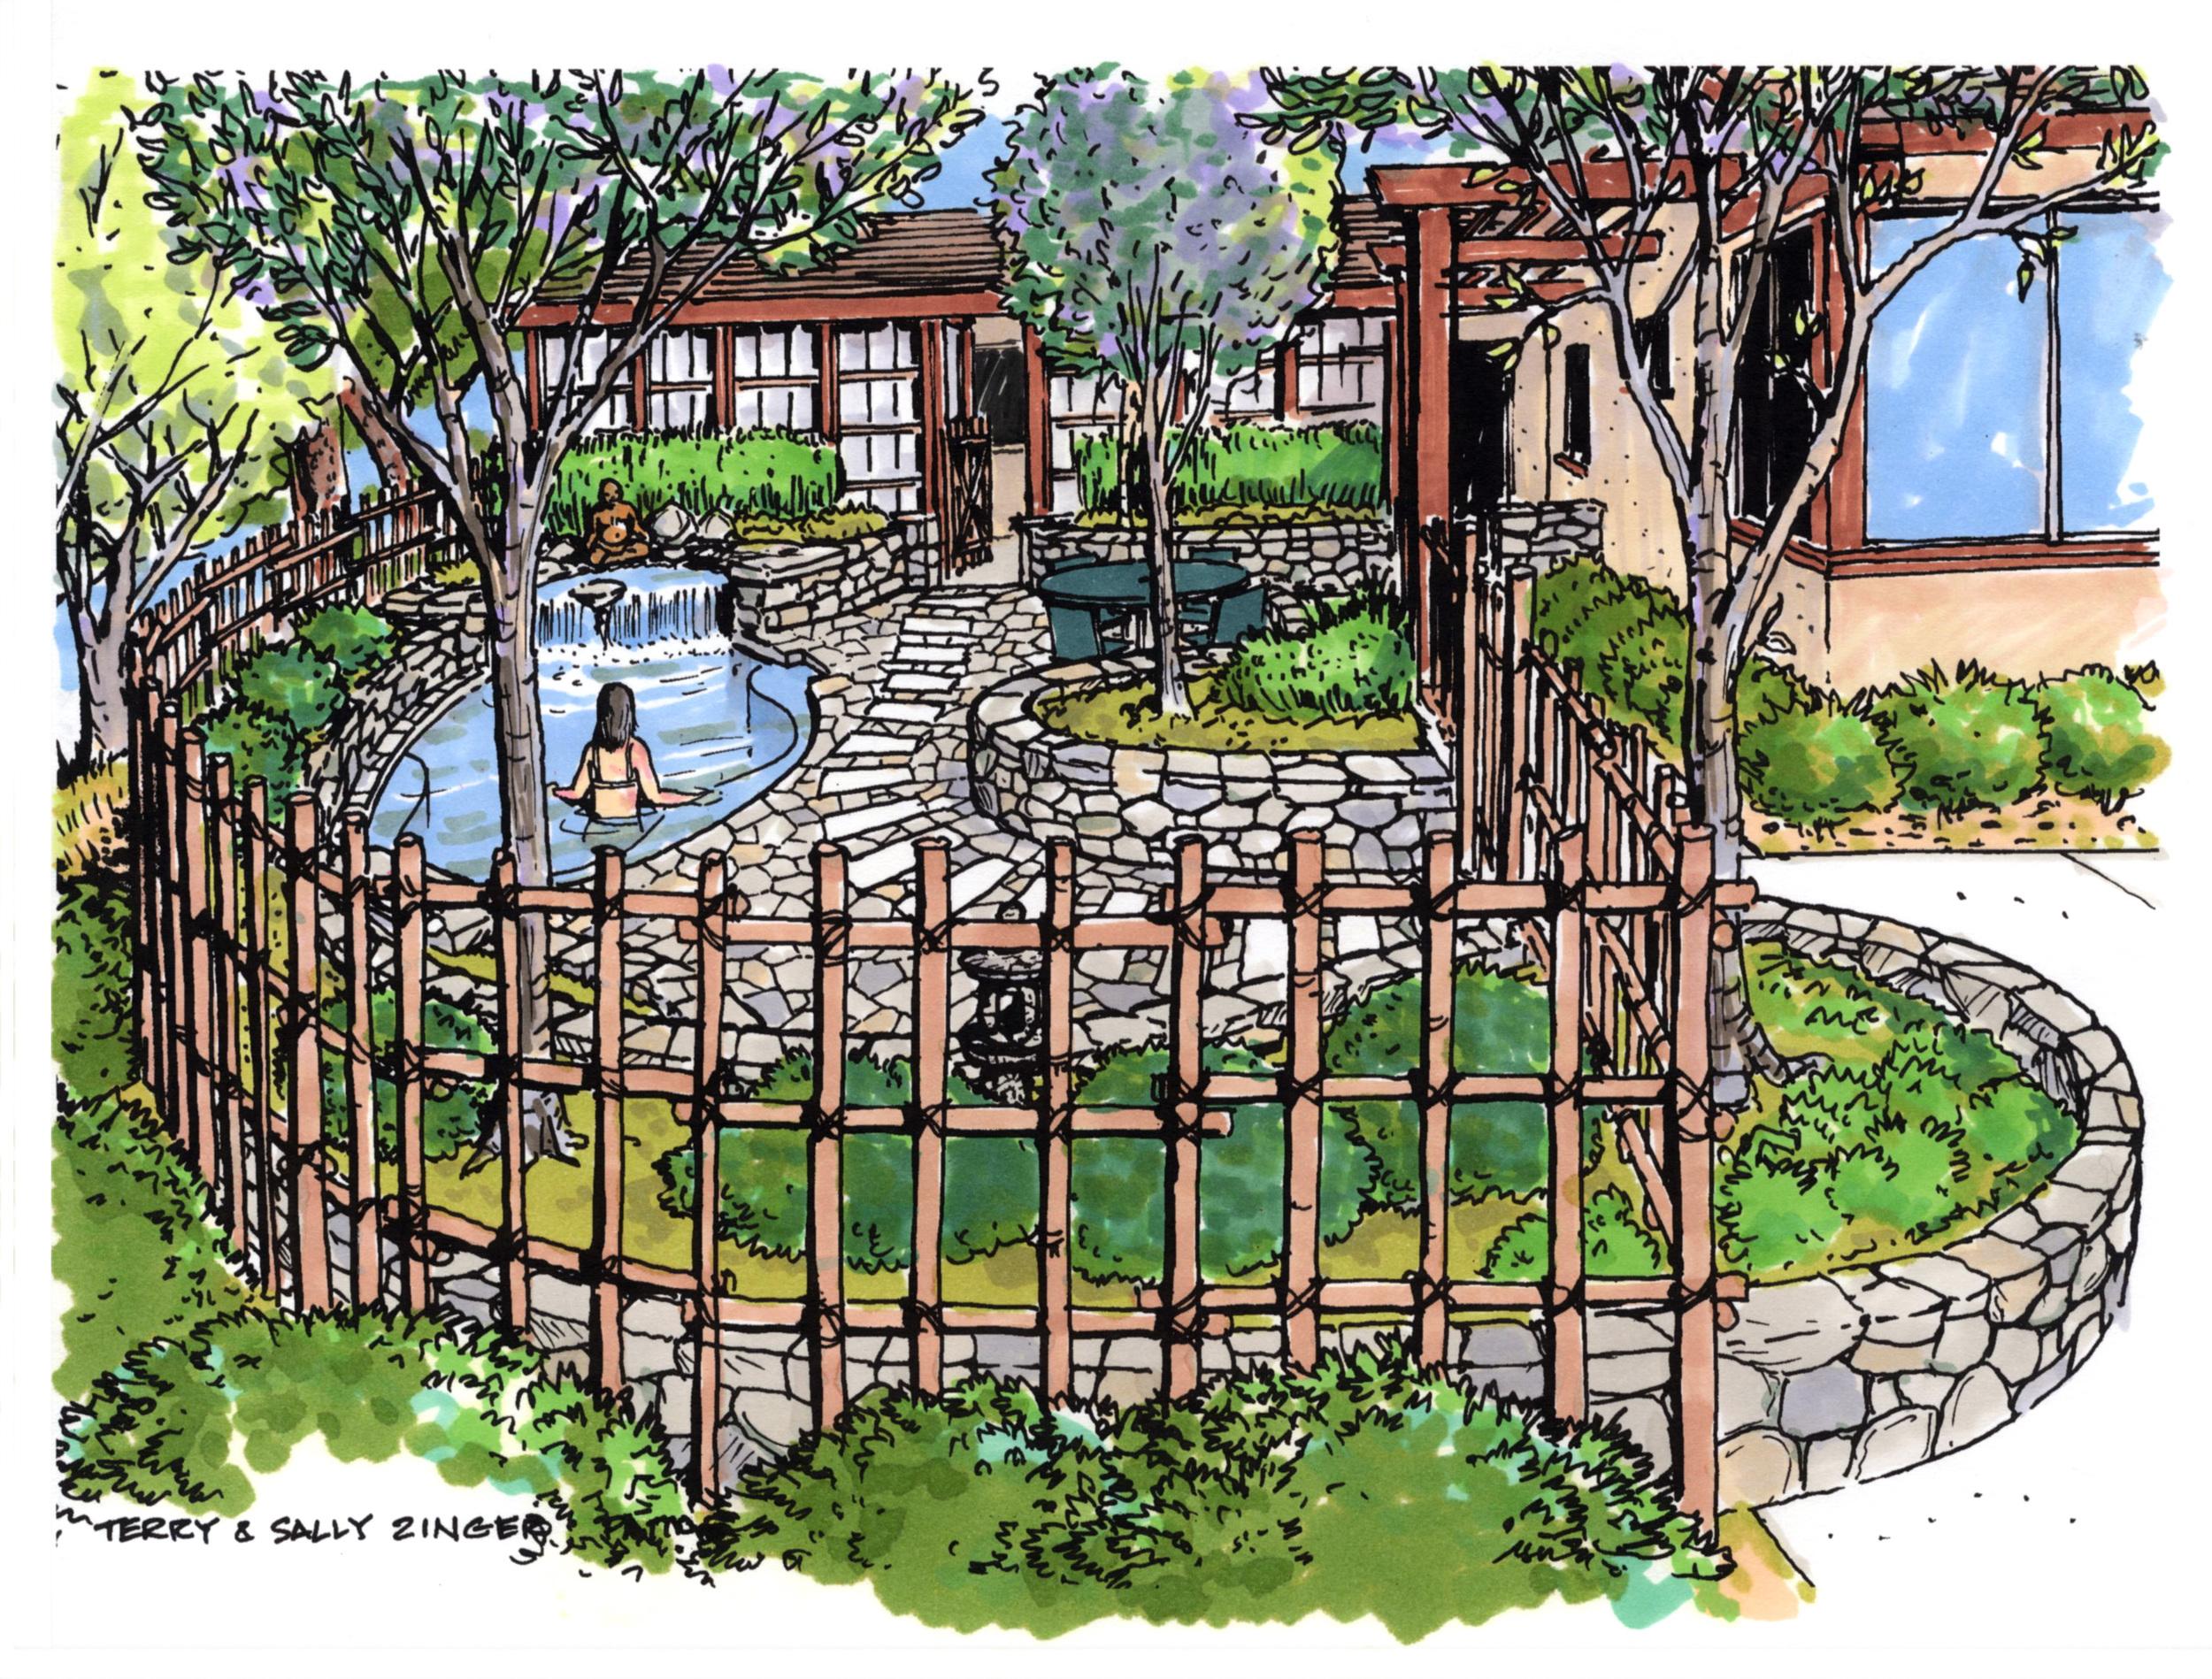 Terry and Sally Zinger's Yard_449.jpg